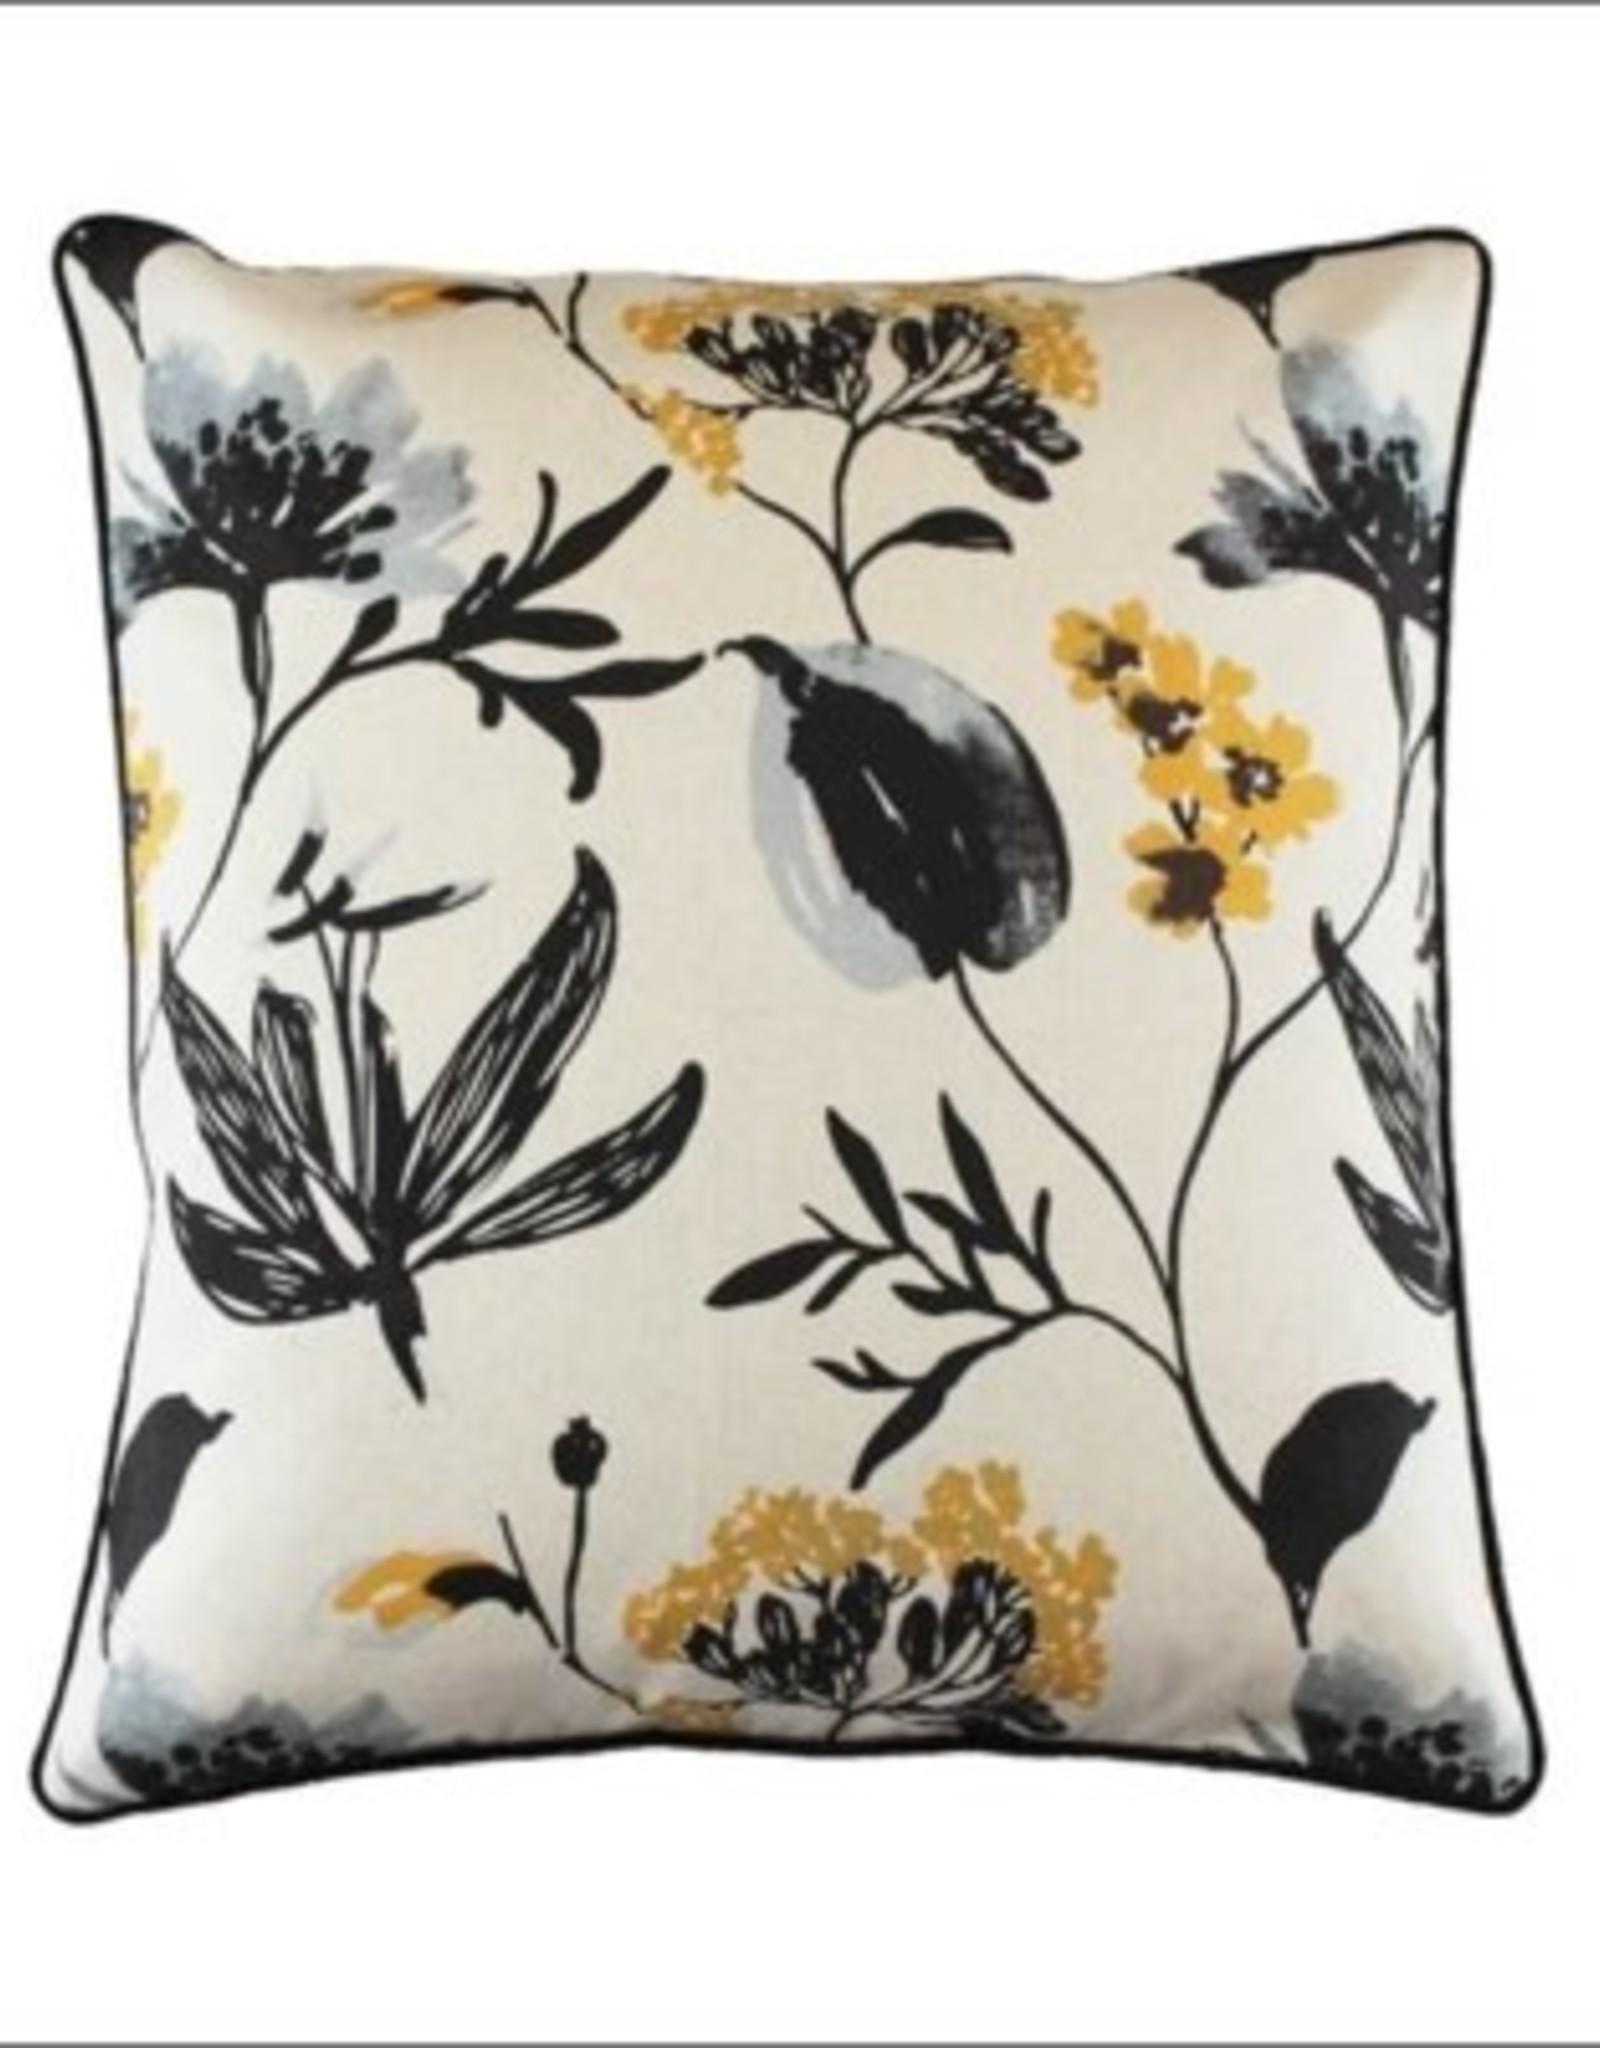 Cushions CJ White Flowers